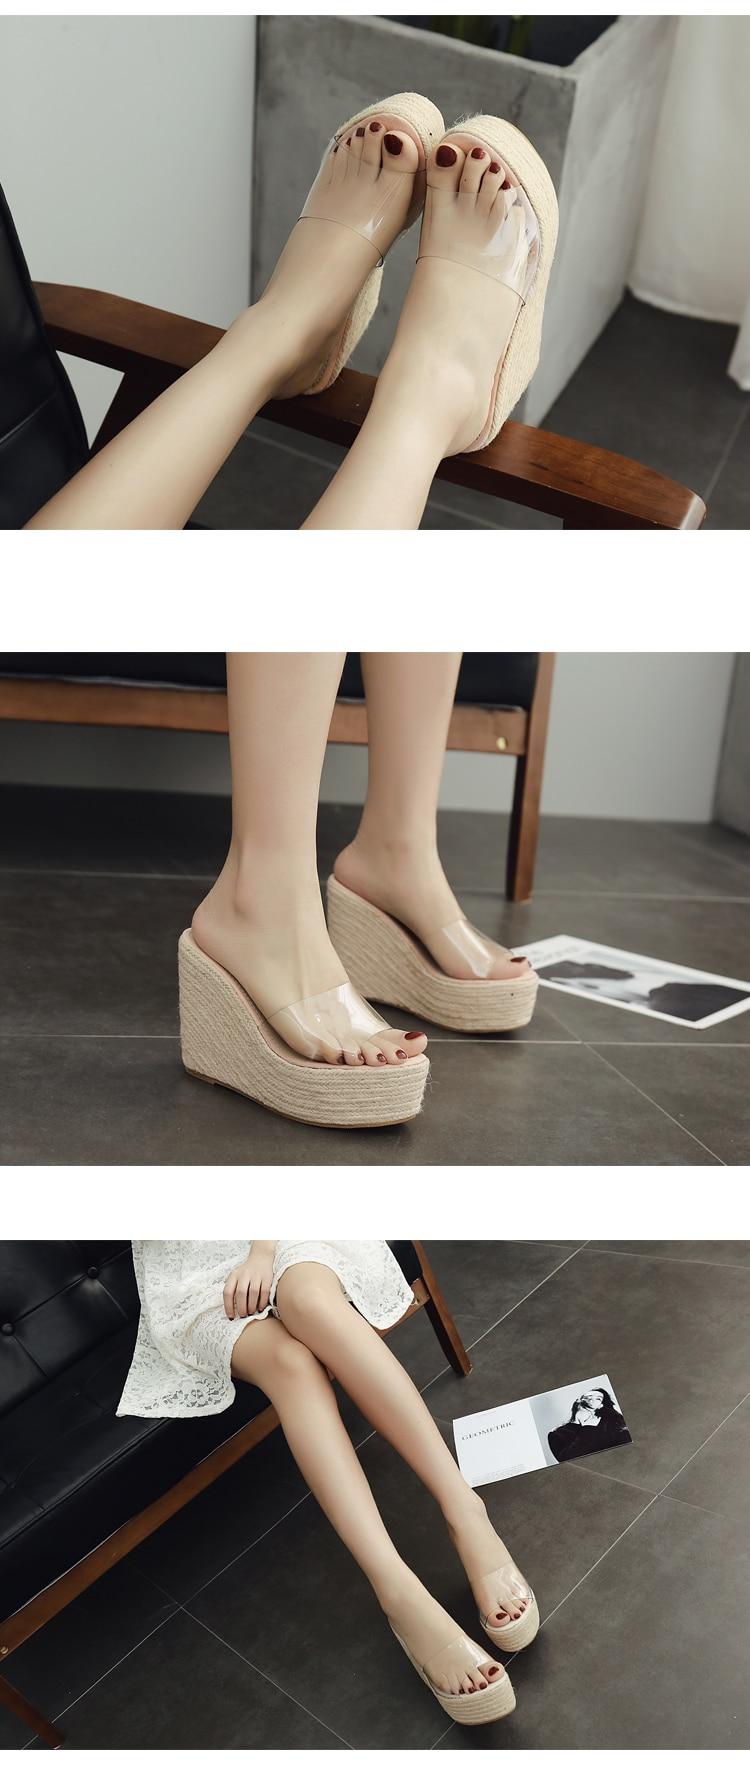 HTB1ZTY1dL6TBKNjSZJiq6zKVFXar Eilyken 2019 New Summer PVC Jelly Sandals slippers Shoes Casual Sexy Wedges 11.5CM Women's Sandals slippers size 34-40